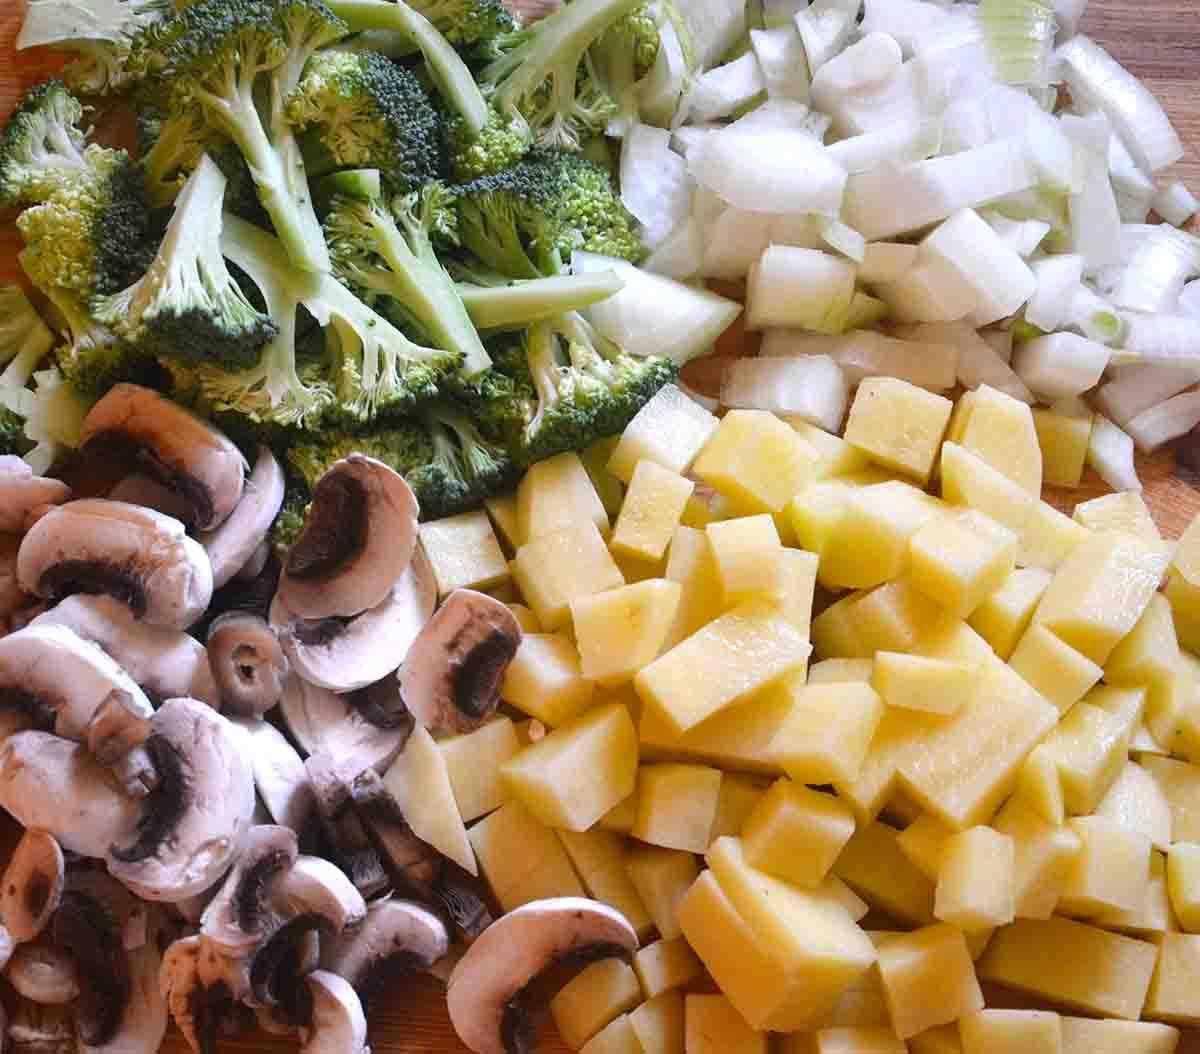 chopped broccoli, mushrooms and potatoes on a board.